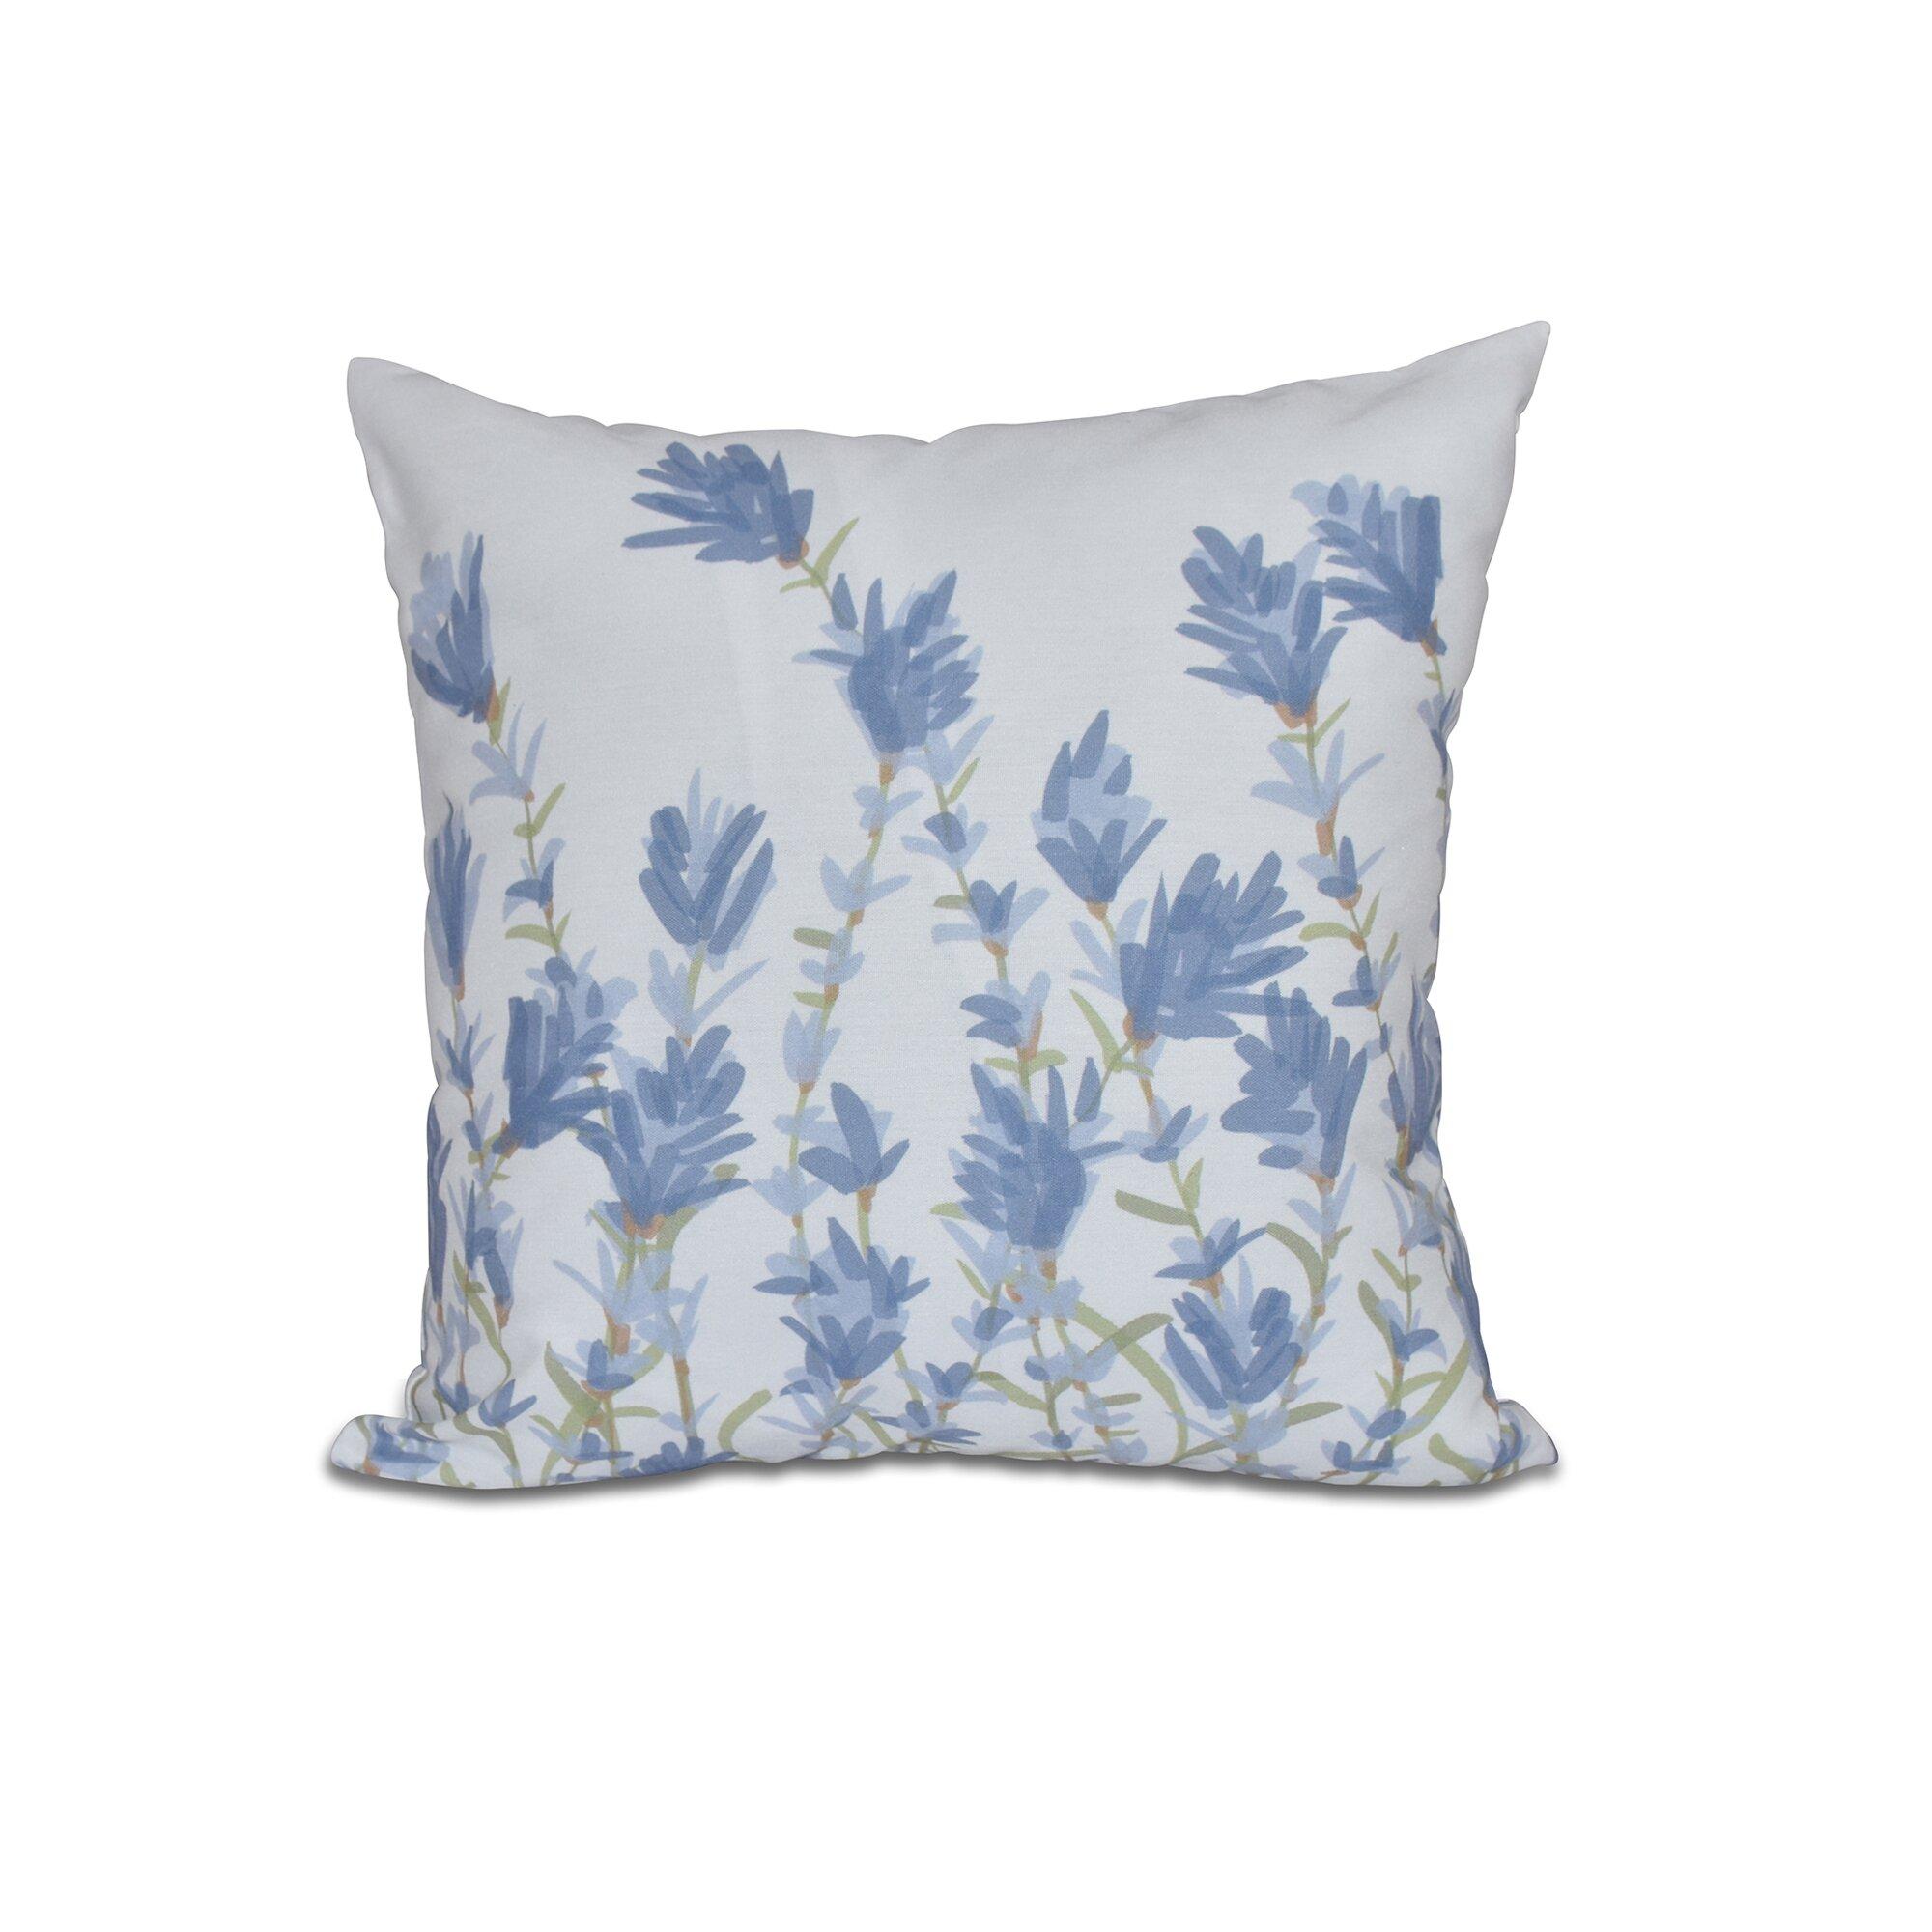 Lavender Flower Throw Pillow : Botanical Blooms Lavender Floral Outdoor Throw Pillow Wayfair